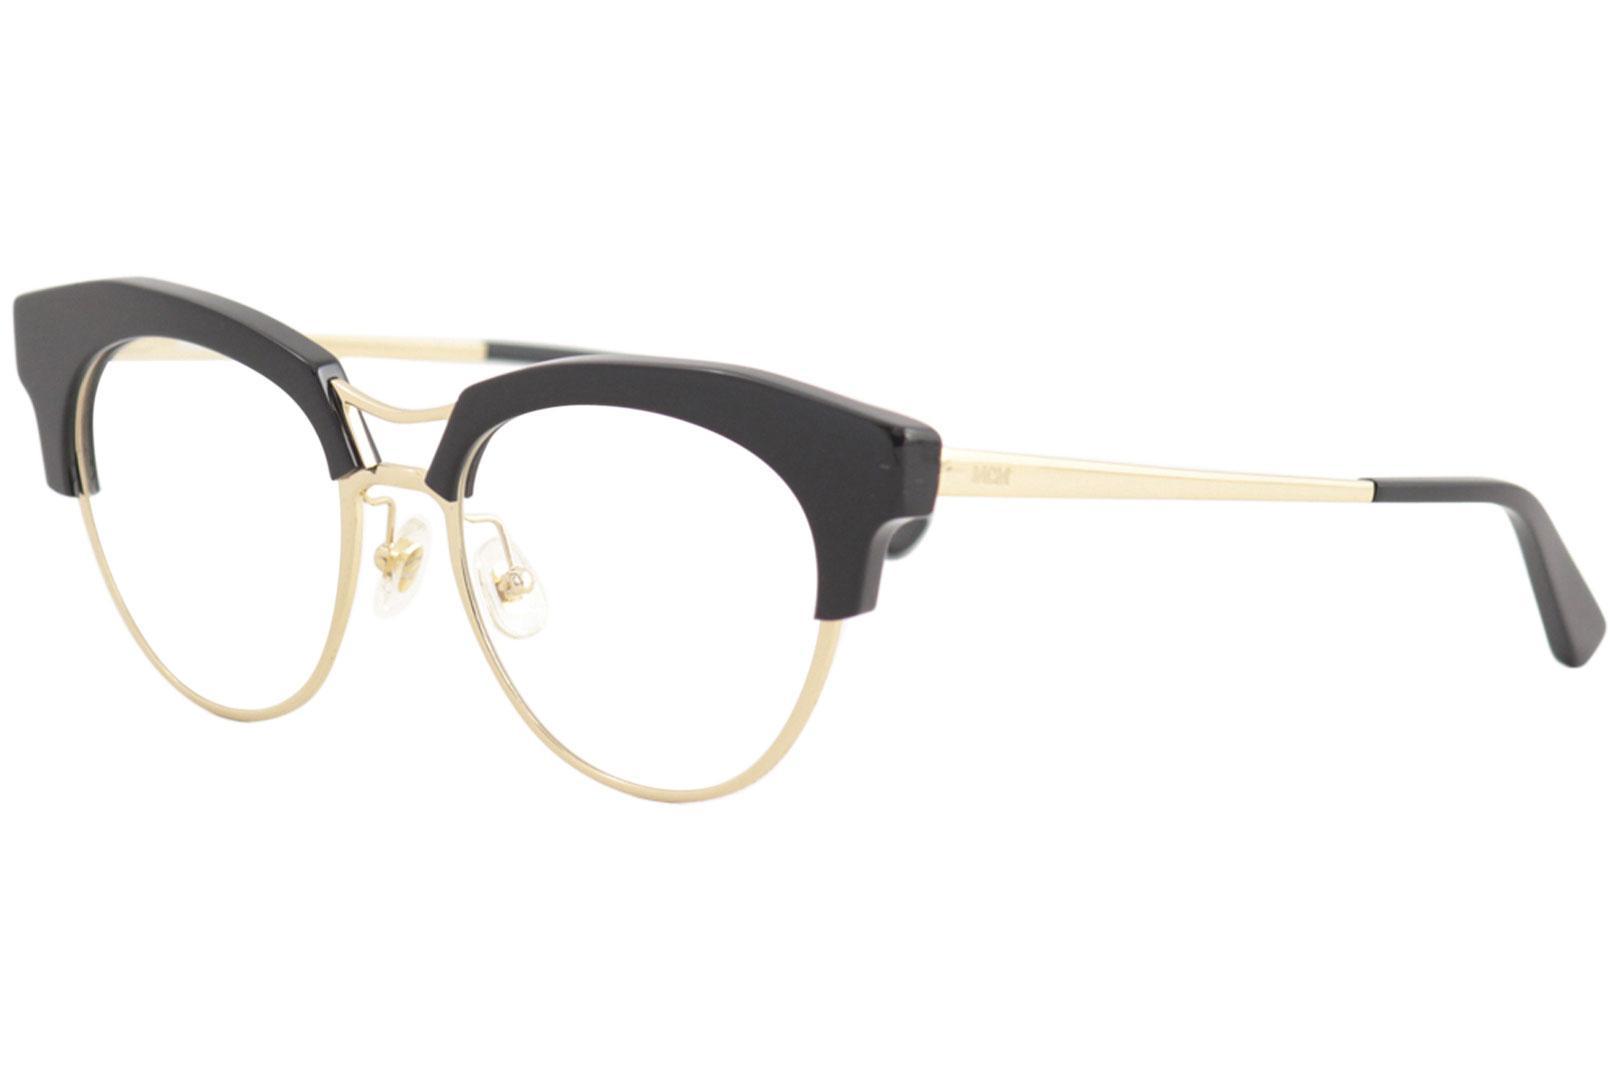 b34bf228b72 MCM Women s Eyeglasses MCM2106 MCM 2106 Full Rim Optical Frame